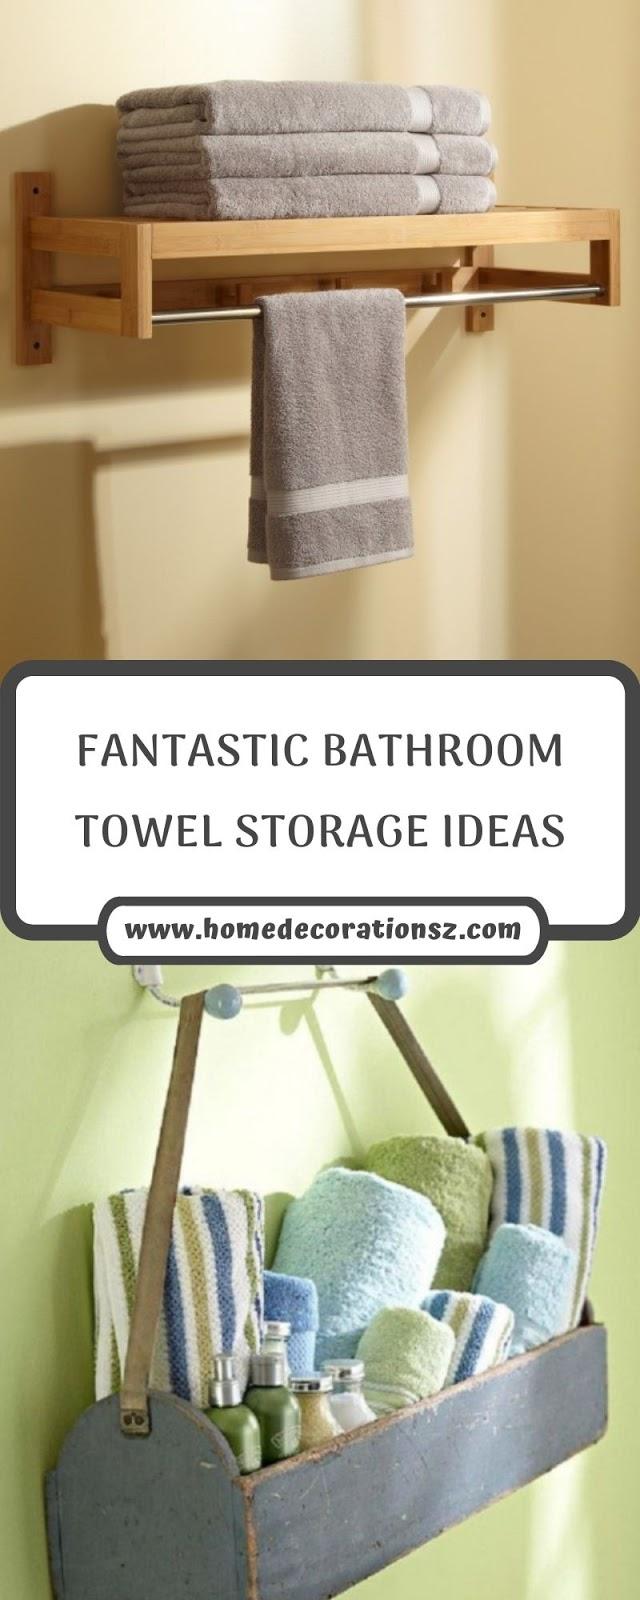 FANTASTIC BATHROOM TOWEL STORAGE IDEAS